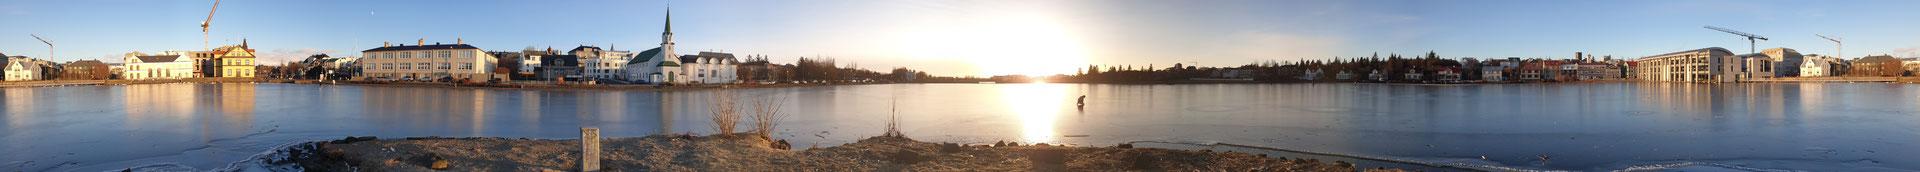 In Reykjavík auf dem zugefrorenem Stadtsee